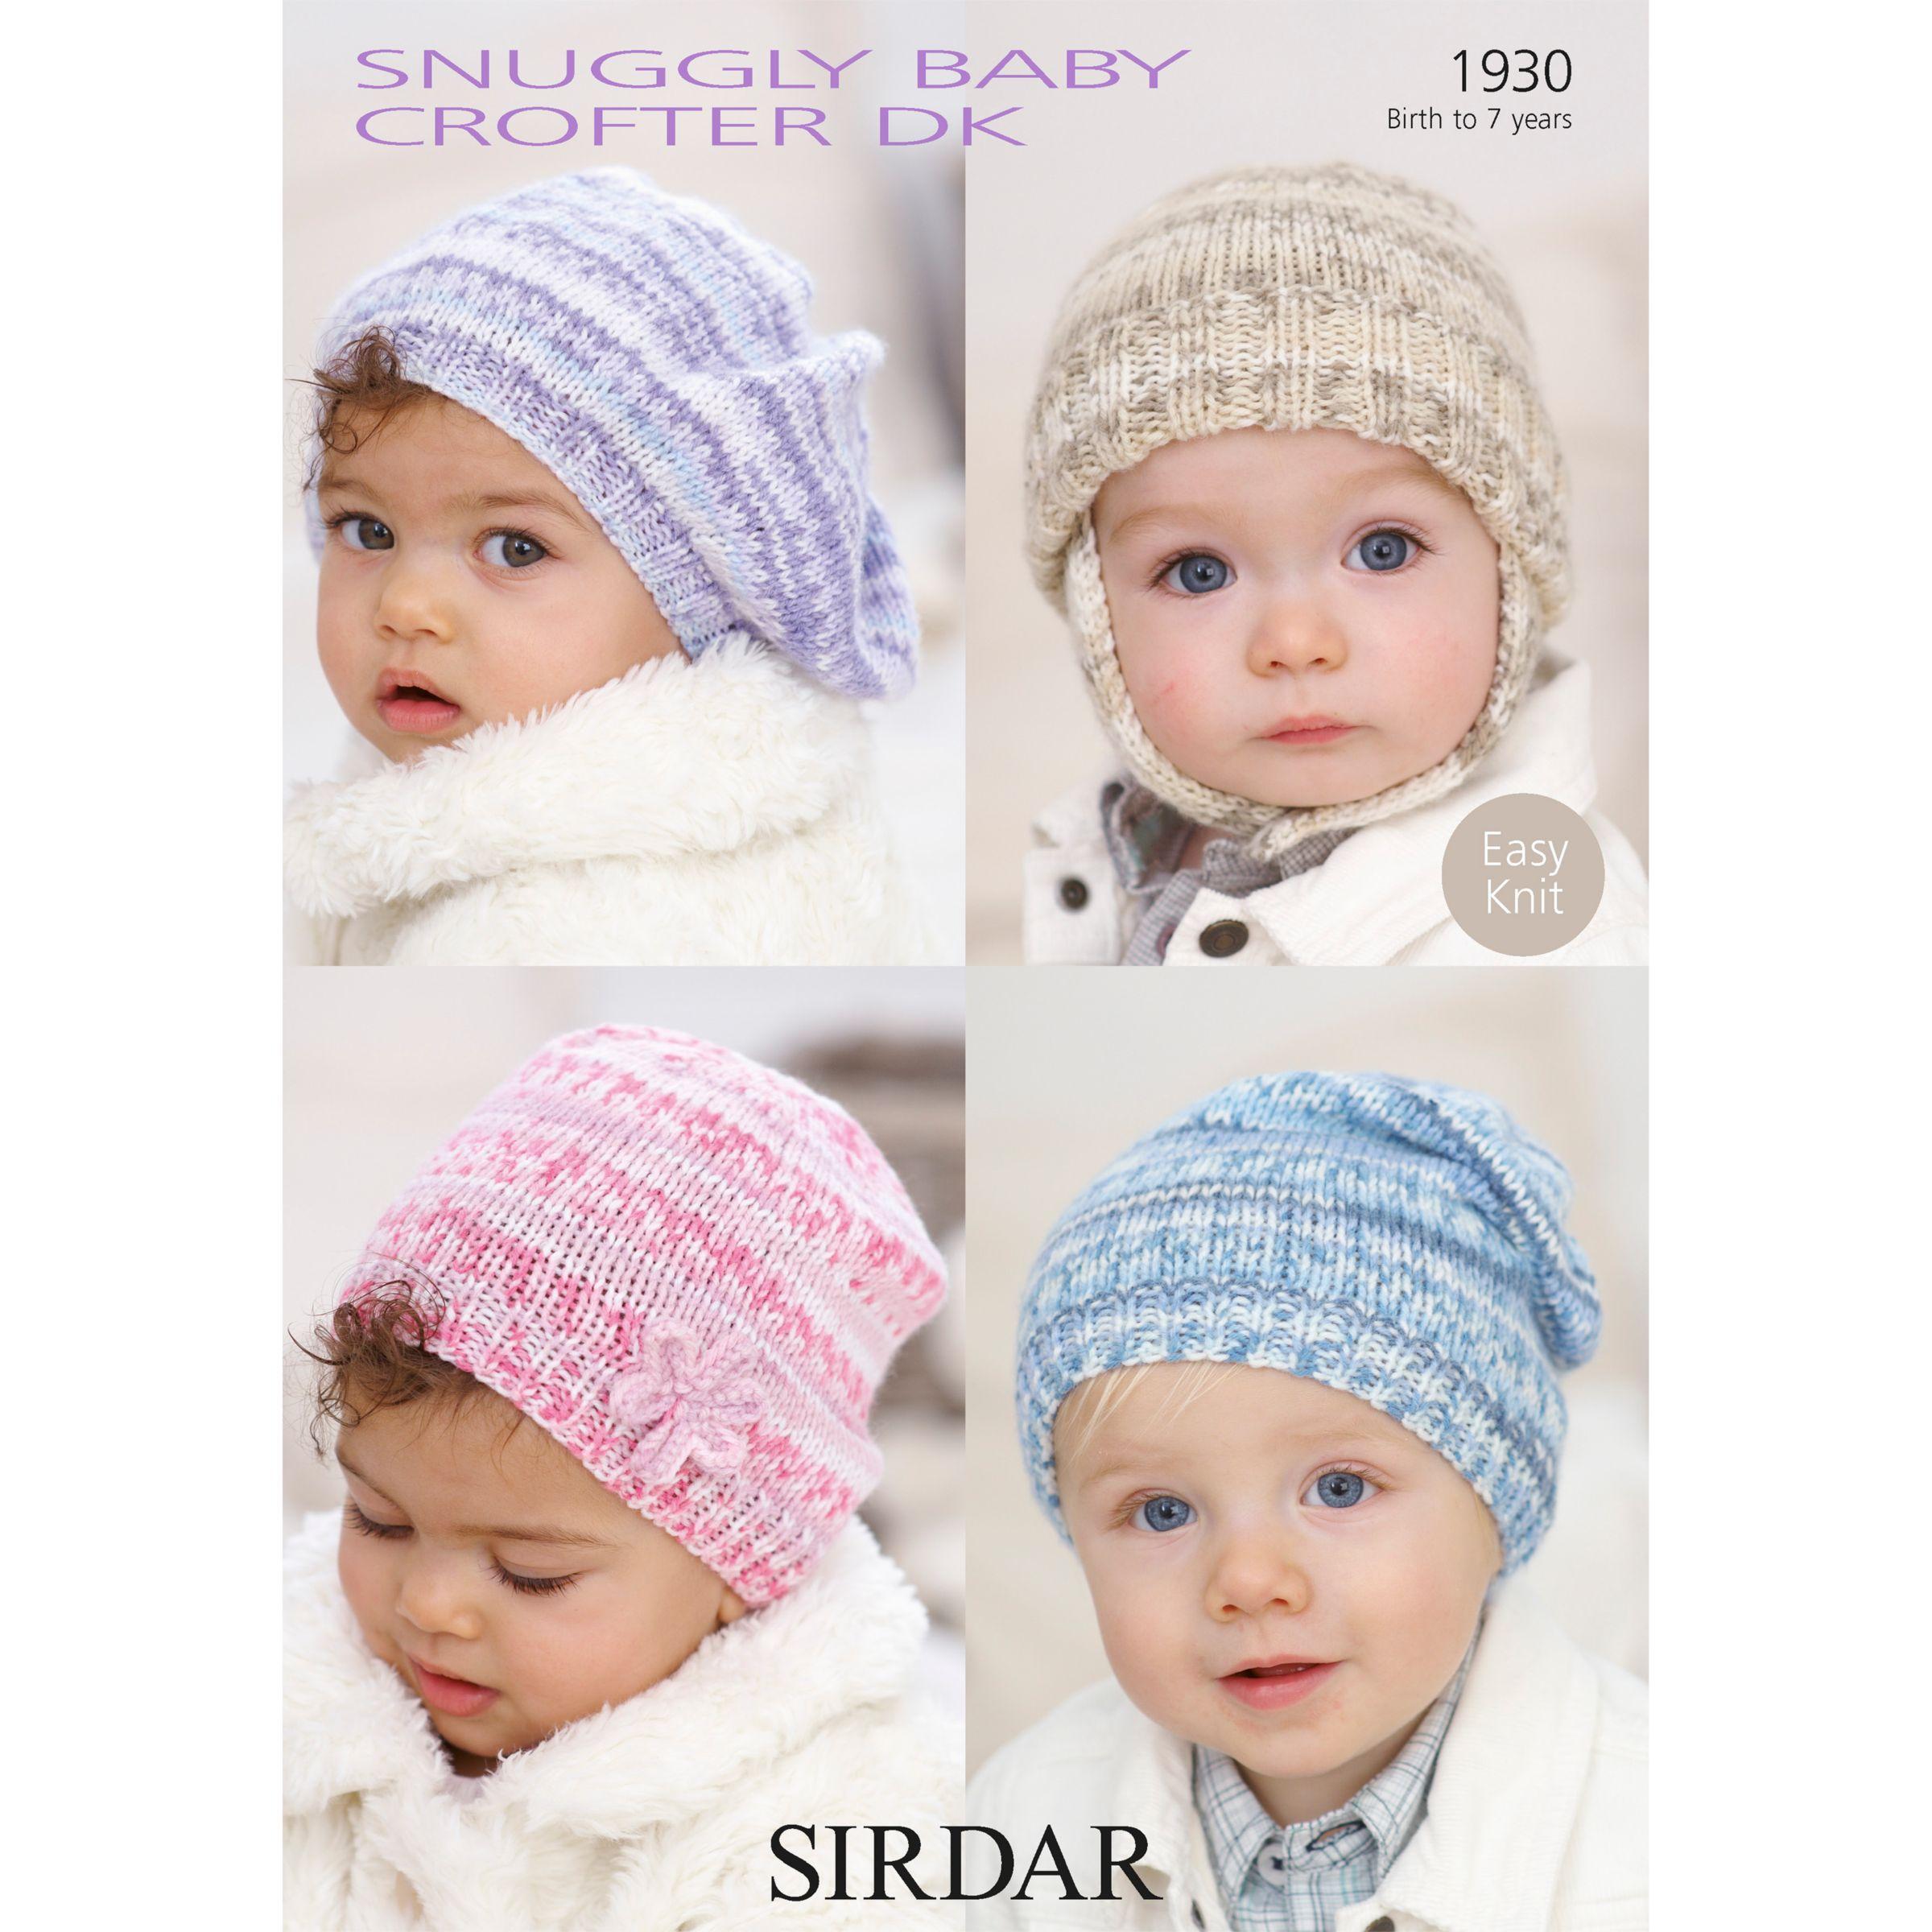 Buy Sirdar Snuggly Baby Hats Knitting Pattern, 1930 John Lewis